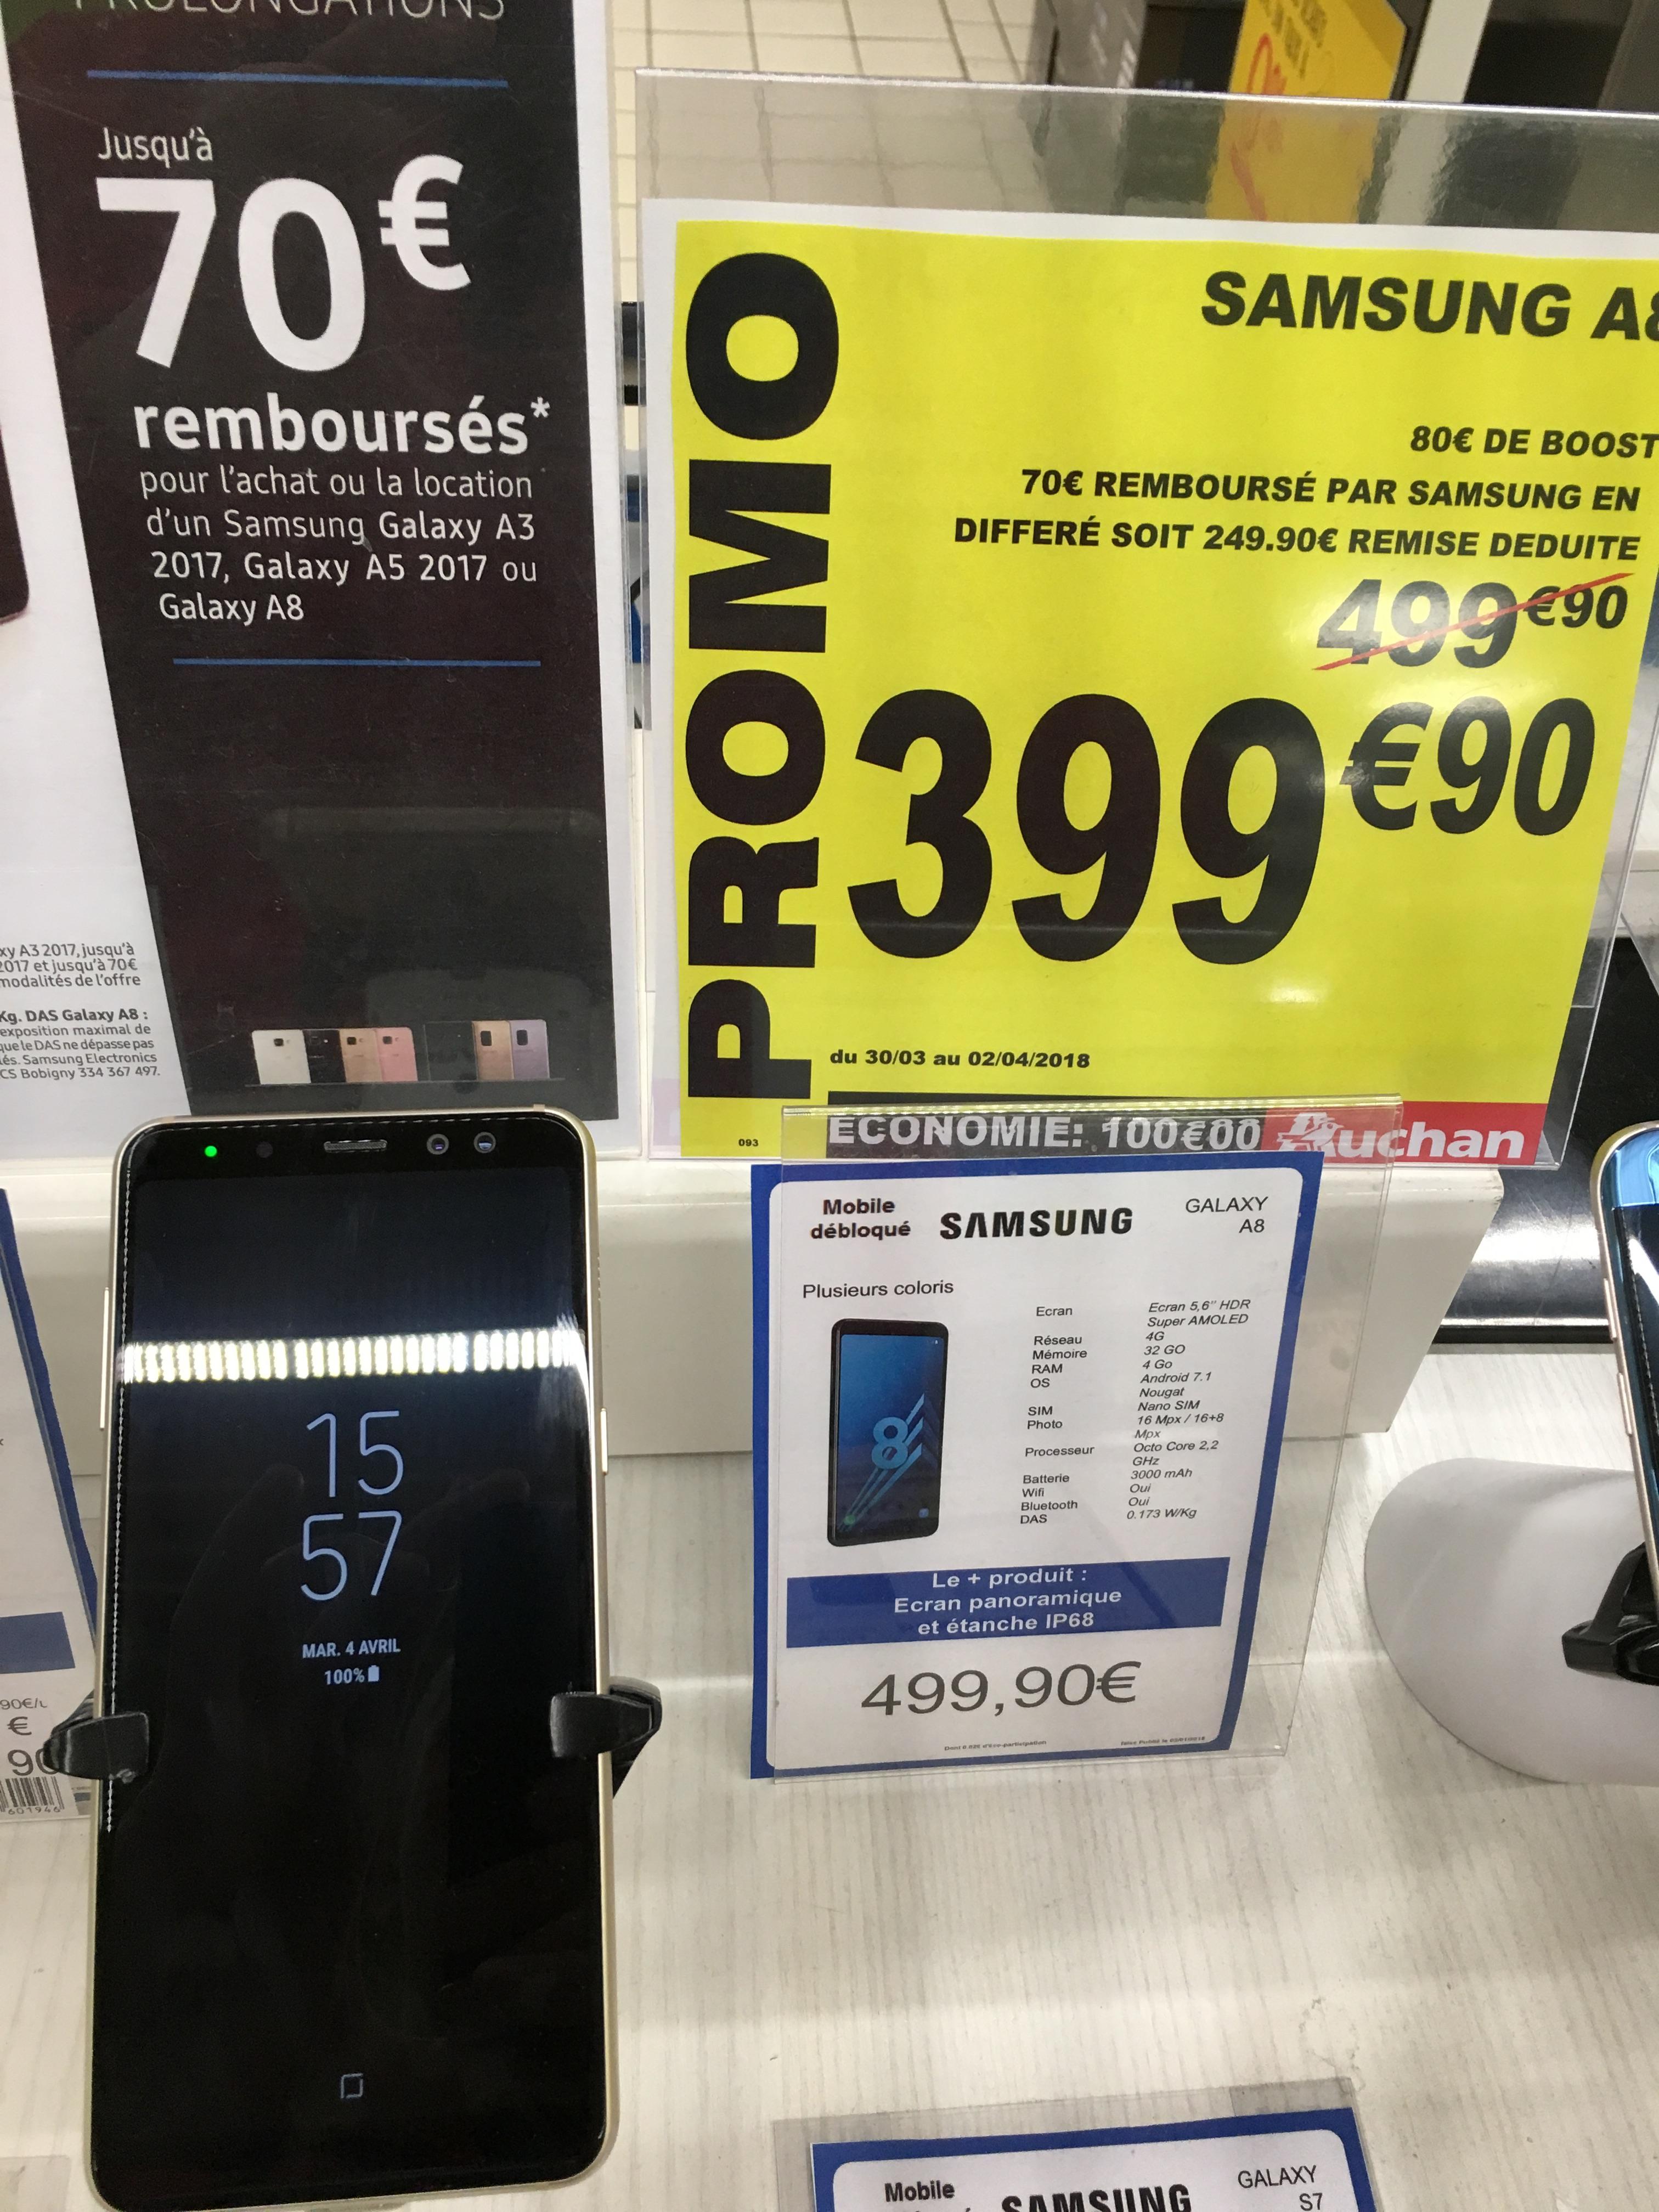 "Smartphone 5.6"" Samsung Galaxy A8 (2018) - Full HD+, Exynos 7885, RAM 4 Go, ROM 32 Go (via reprise en magasin + ODR de 70€) - Villars Porte du Forez (42)"